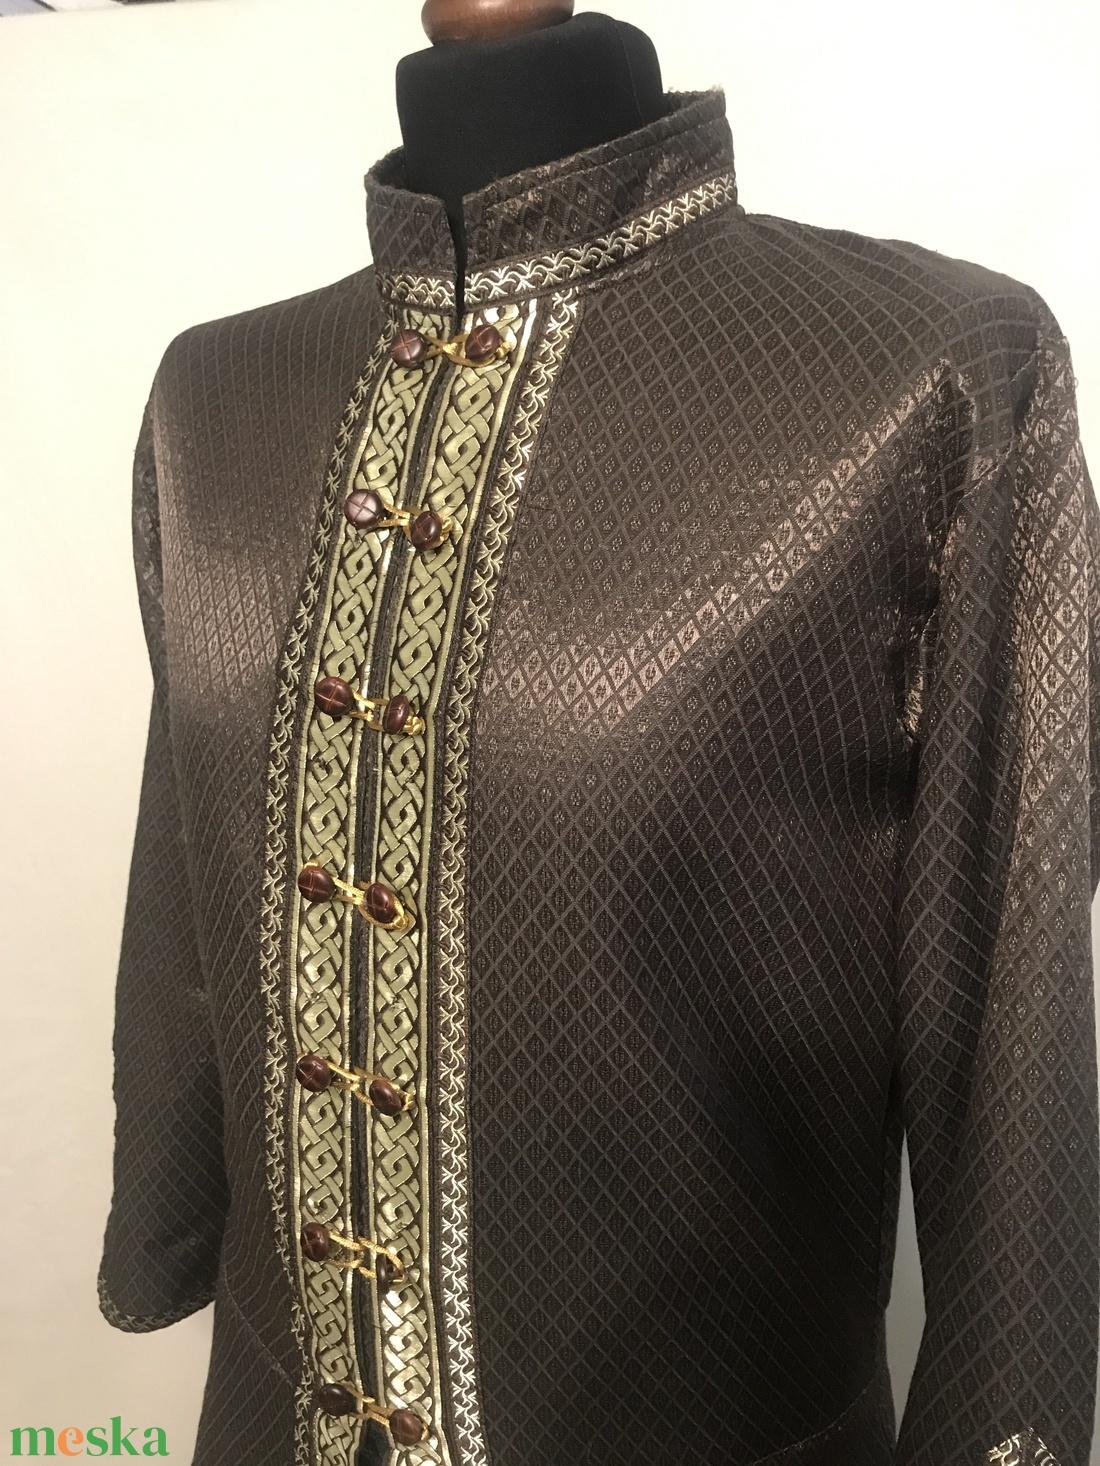 Kaftán brokát - barna-arany  - ruha & divat - férfi ruha - Meska.hu